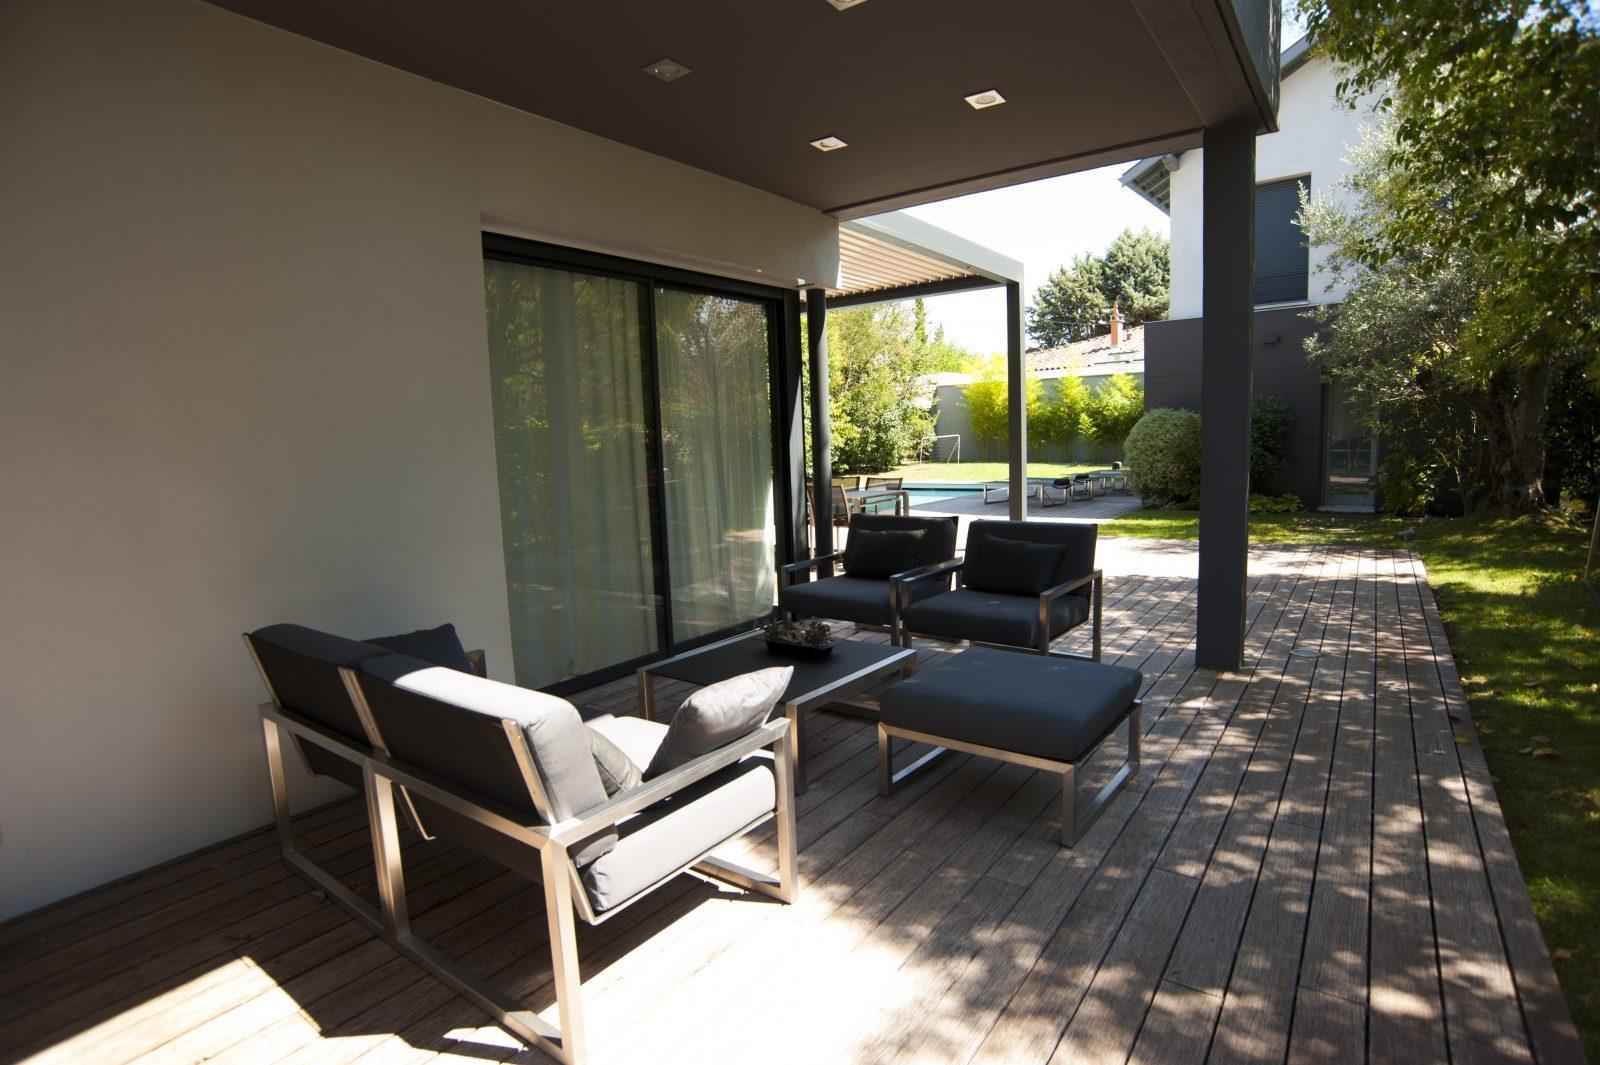 Gros oeuvre construction soci t moga sorebat for Projet maison neuve